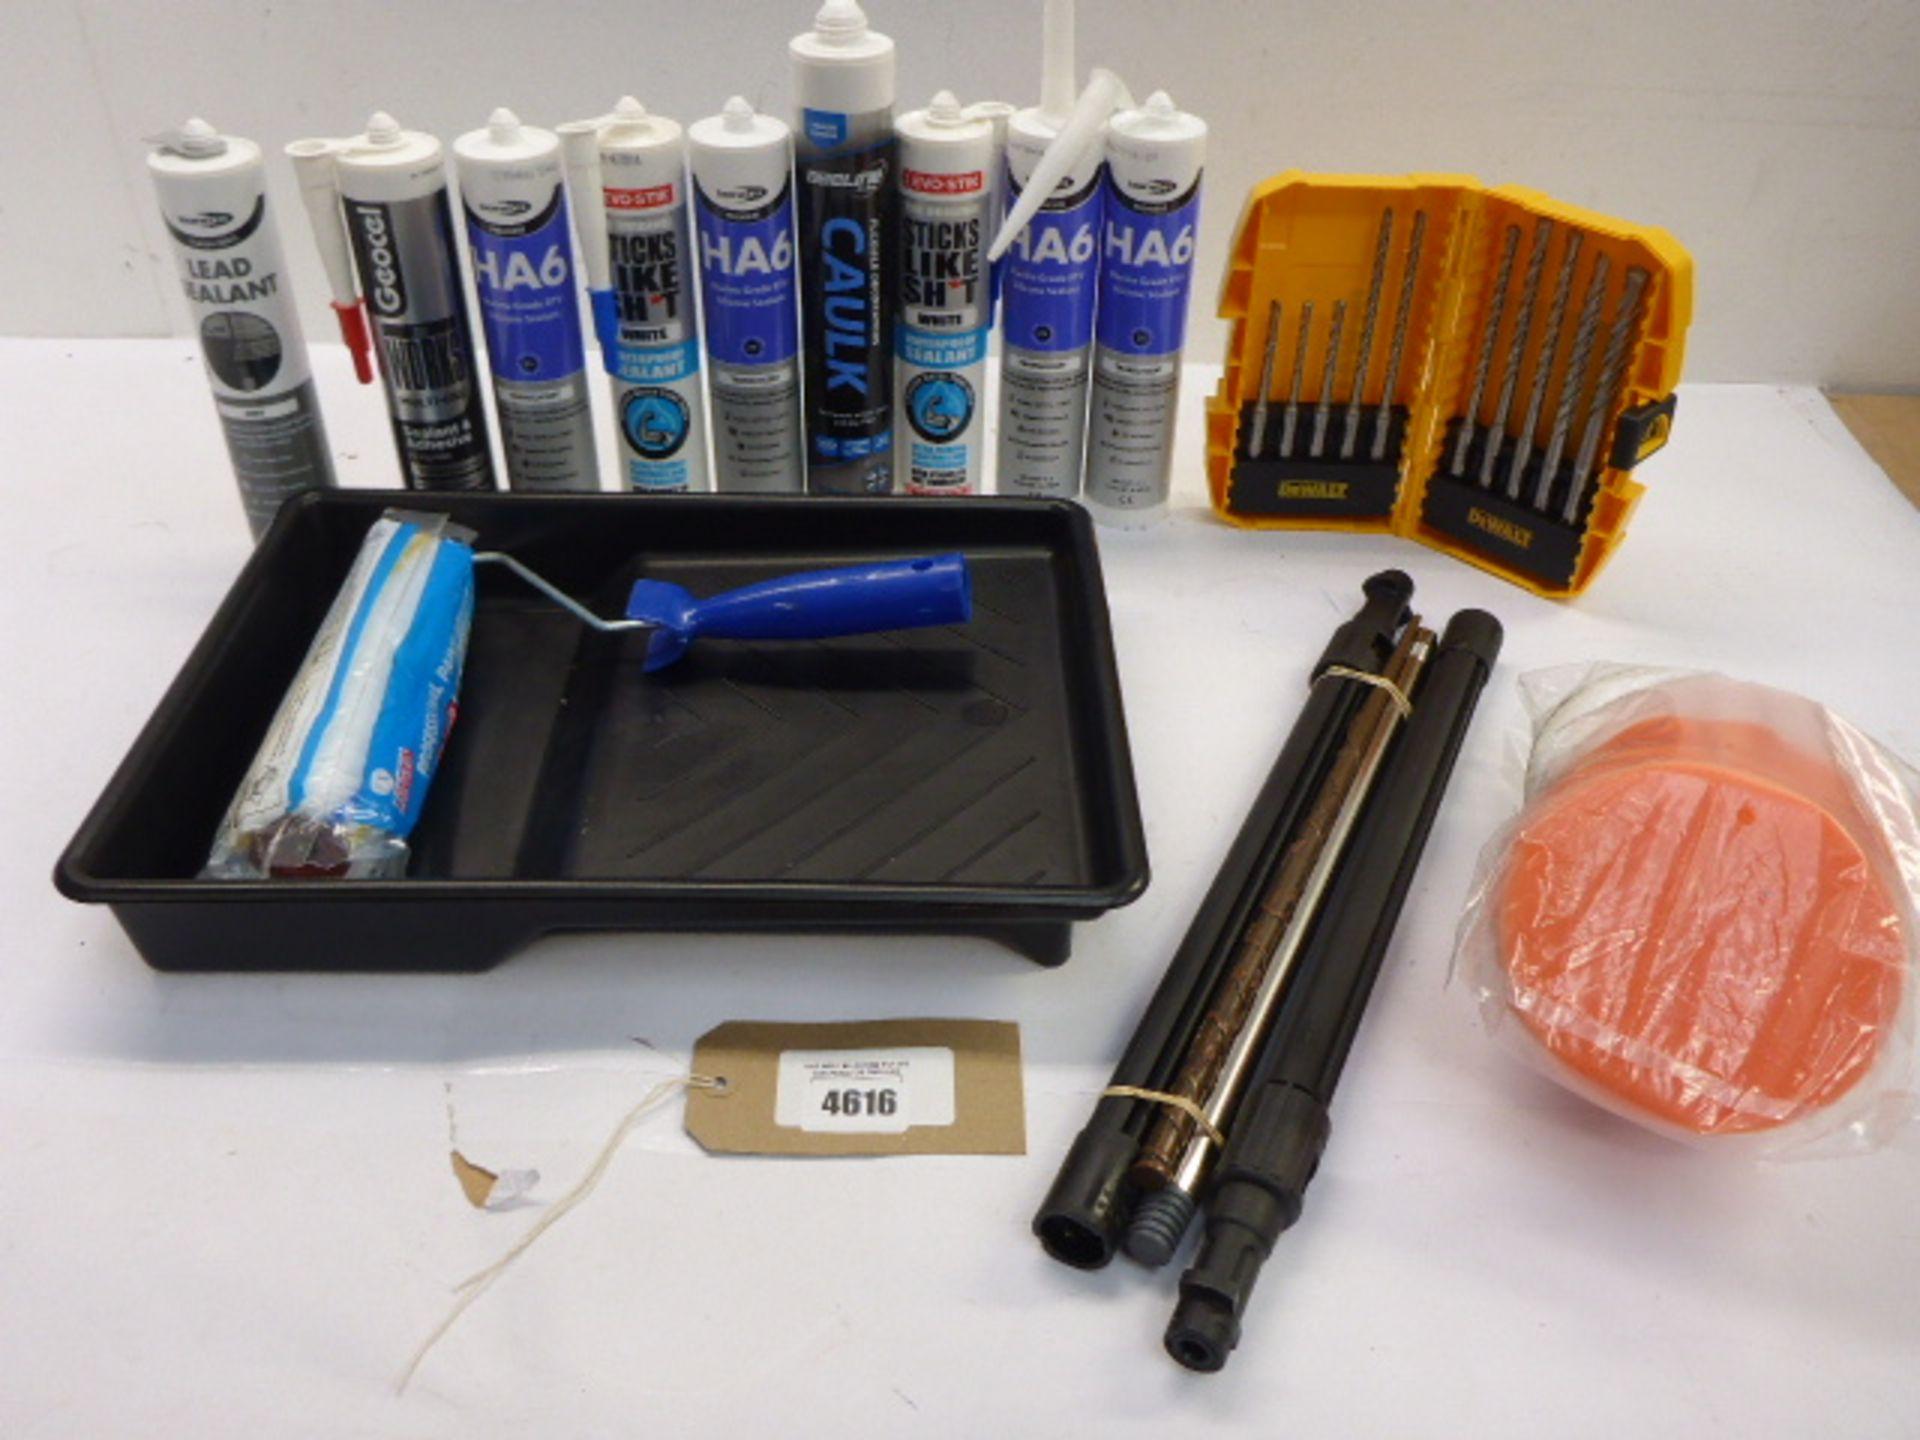 Lot 4616 - DeWalt drill bit set, Silicone sealants, Caulk, Lead sealant, paint roller & tray, Karcher